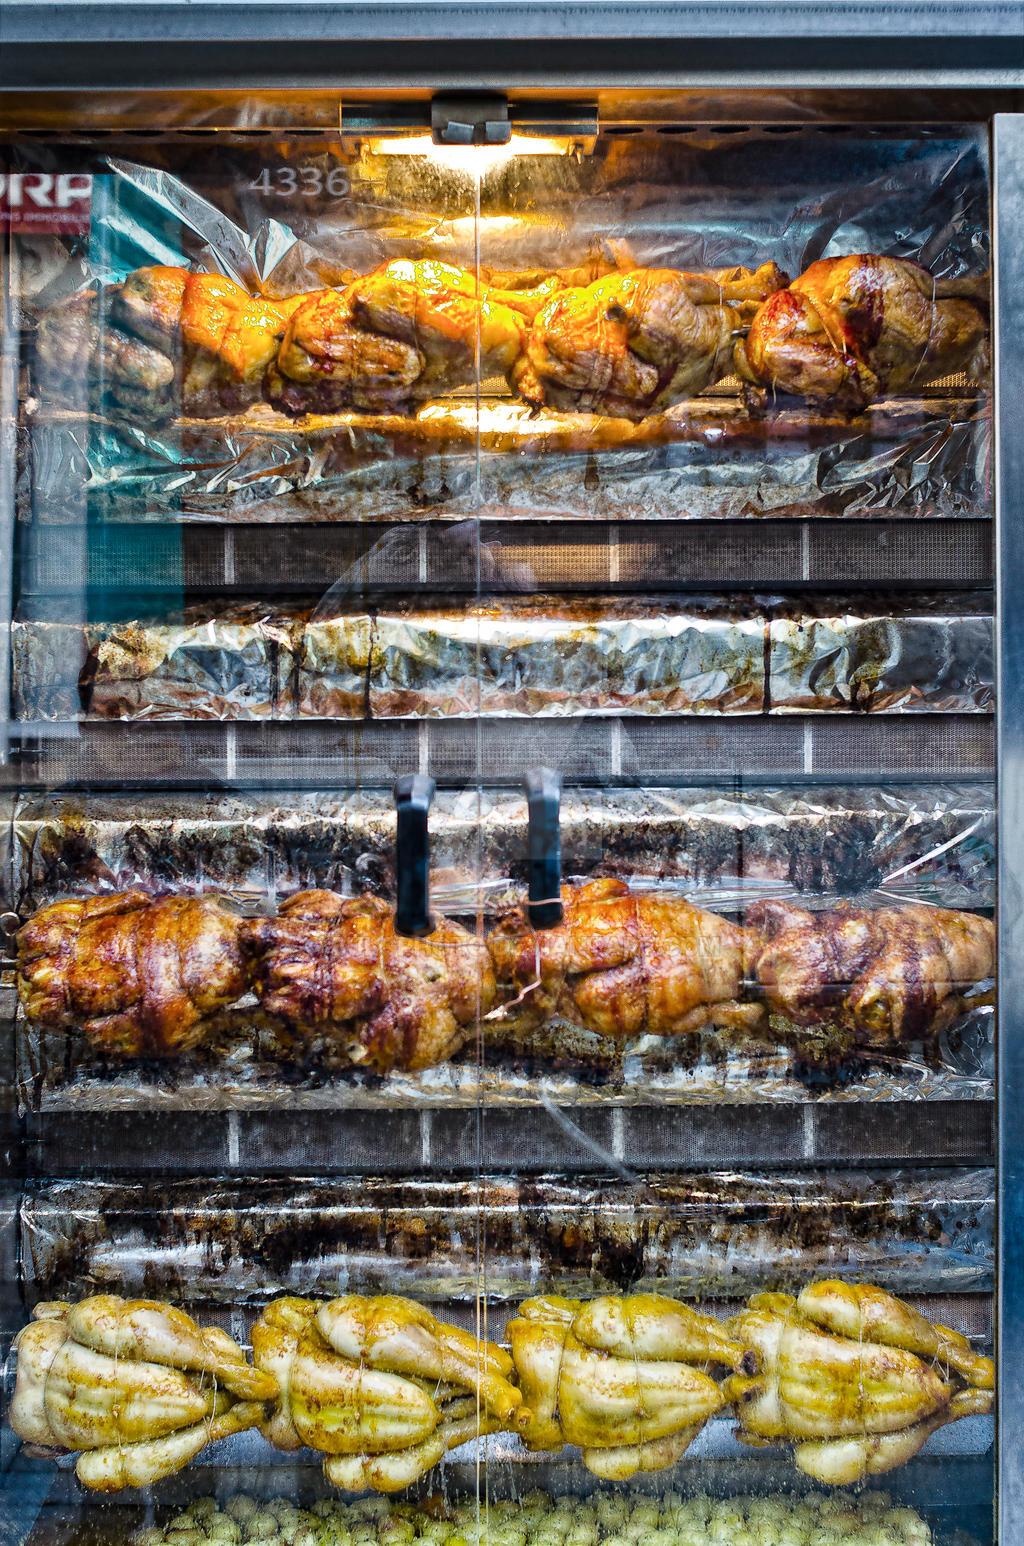 Chicken Cupboard by bulgphoto